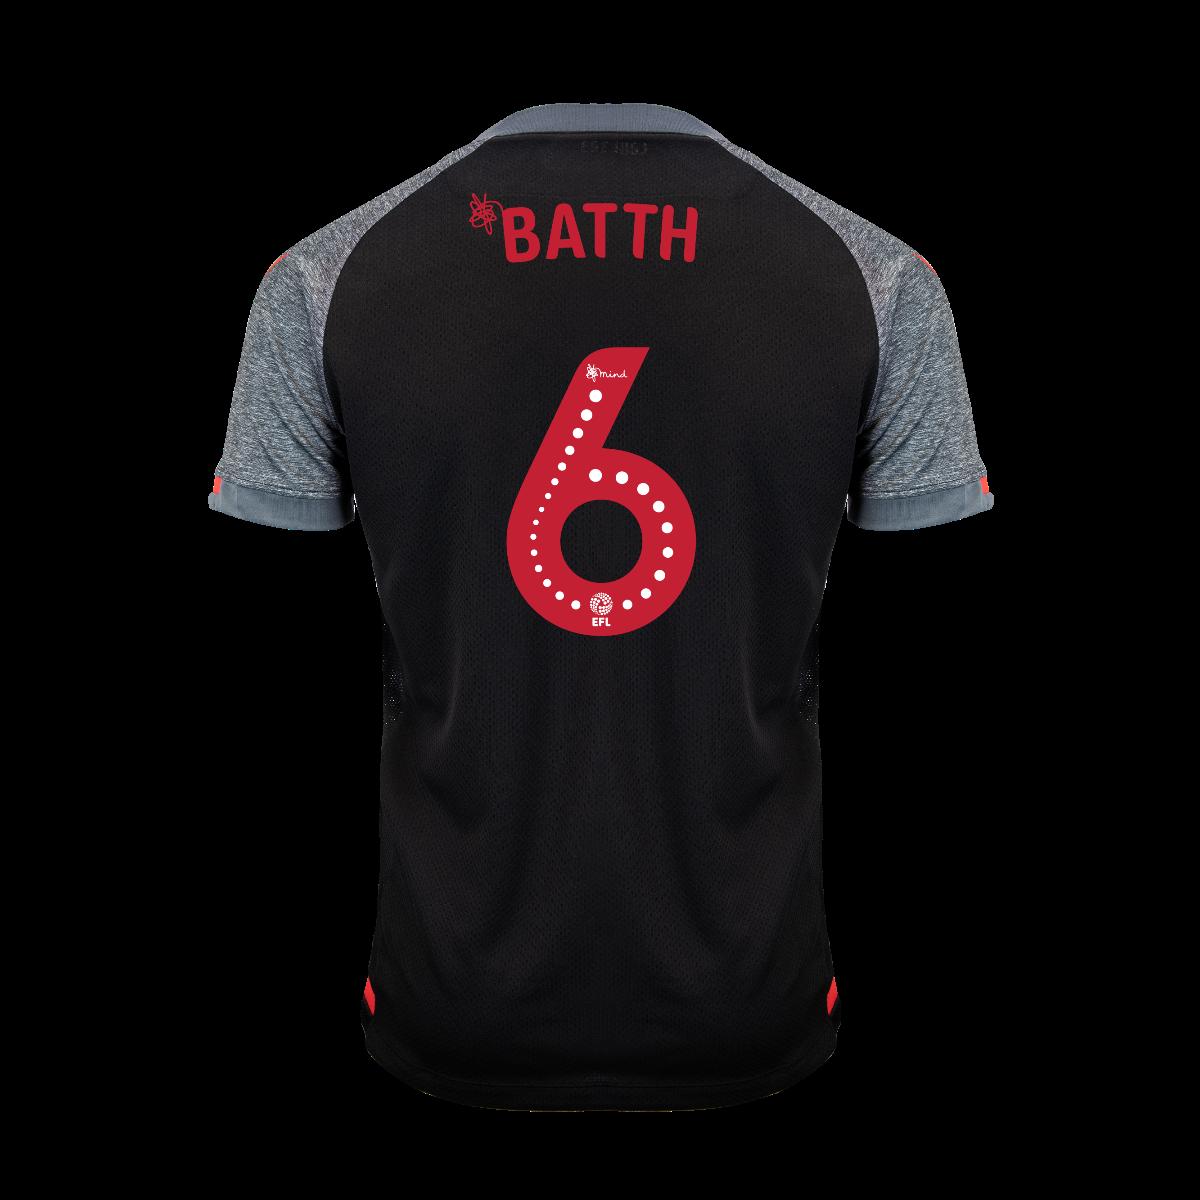 2019/20 Ladies Away Shirt - Batth